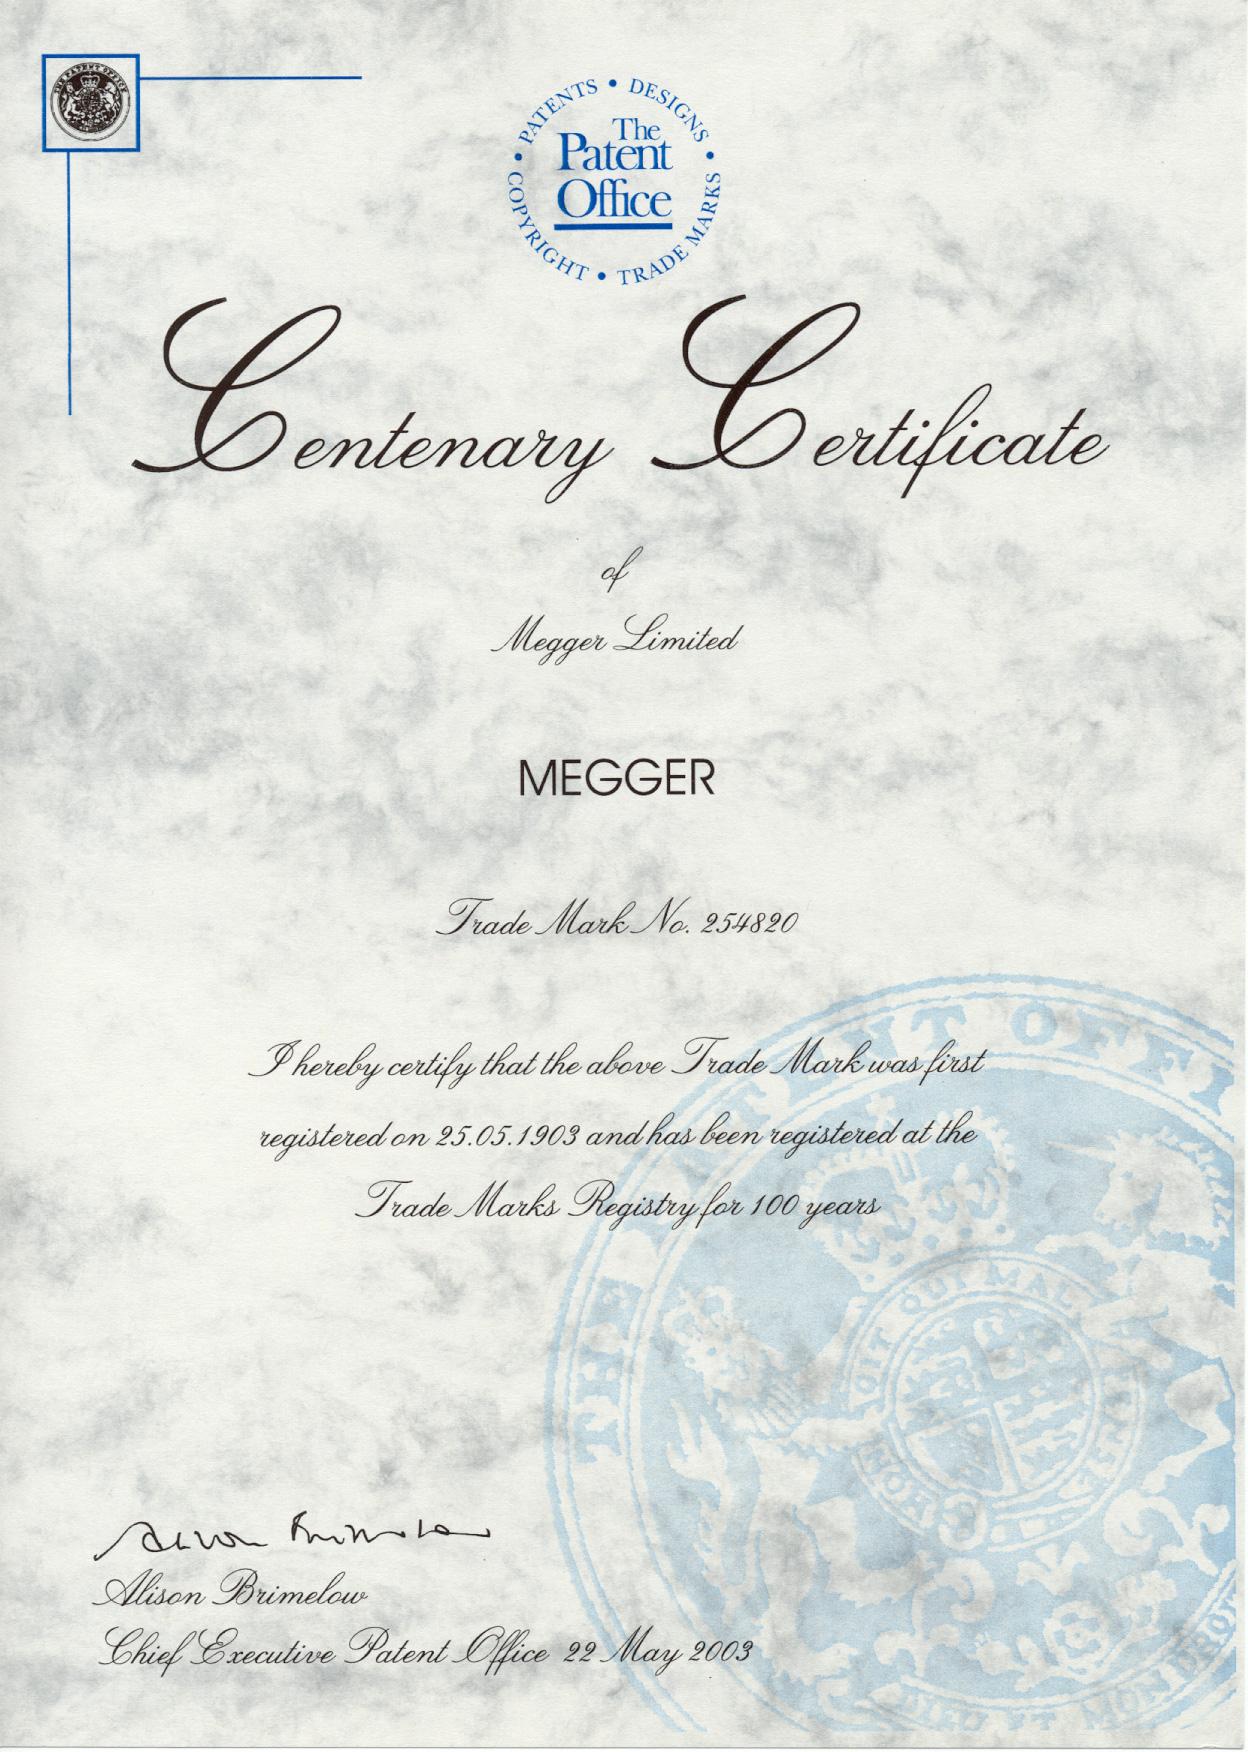 Dateimegger Centenary Certificate By Meggerg Wikipedia